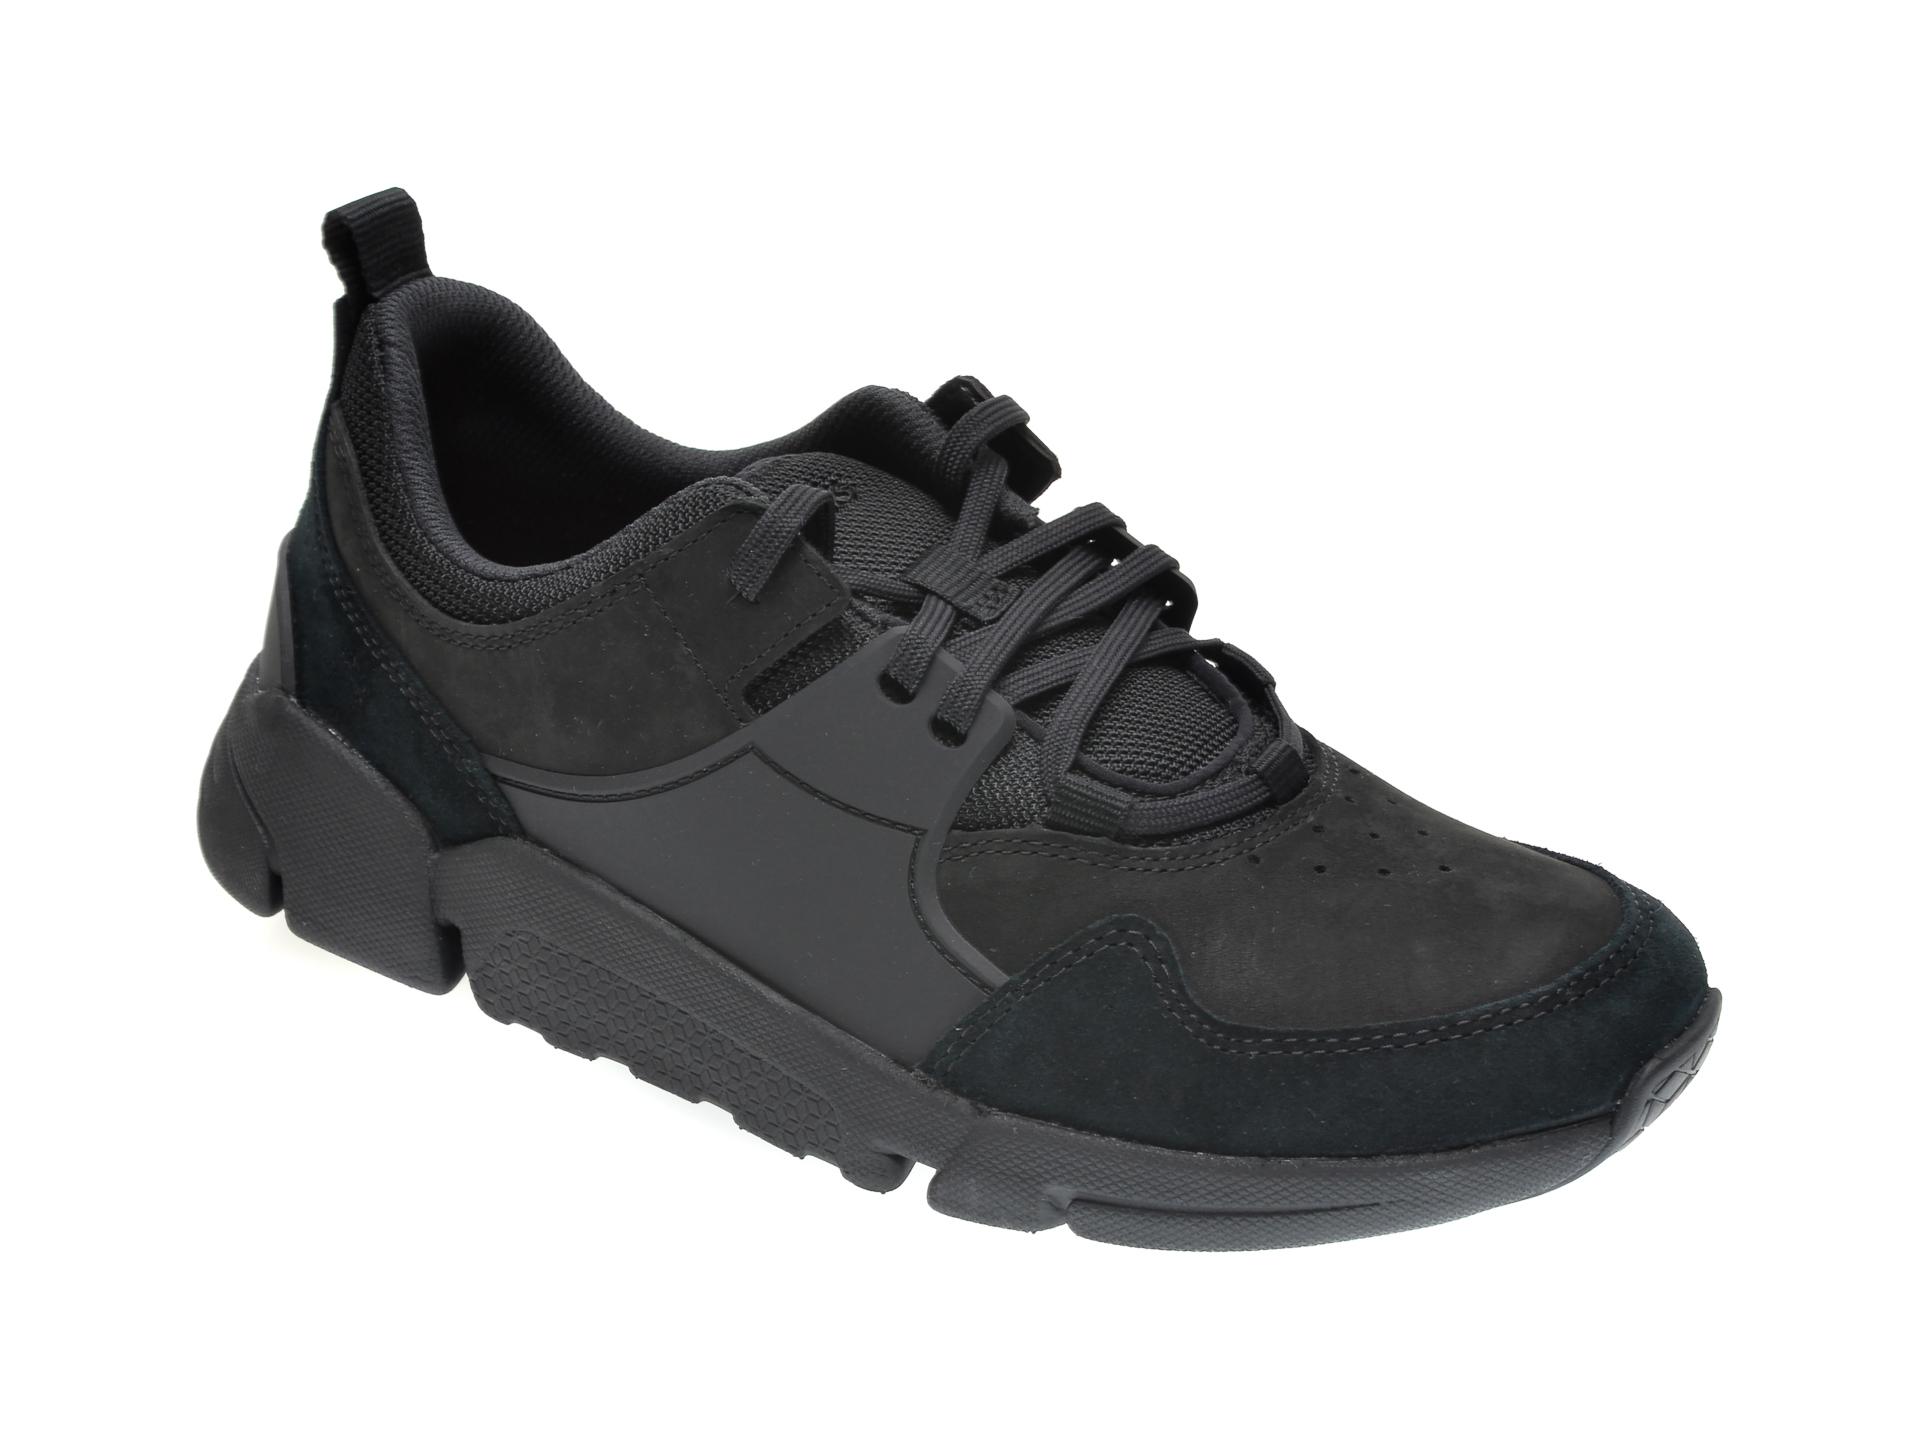 Pantofi CLARKS negri, TRI ACTIVE, din piele naturala imagine